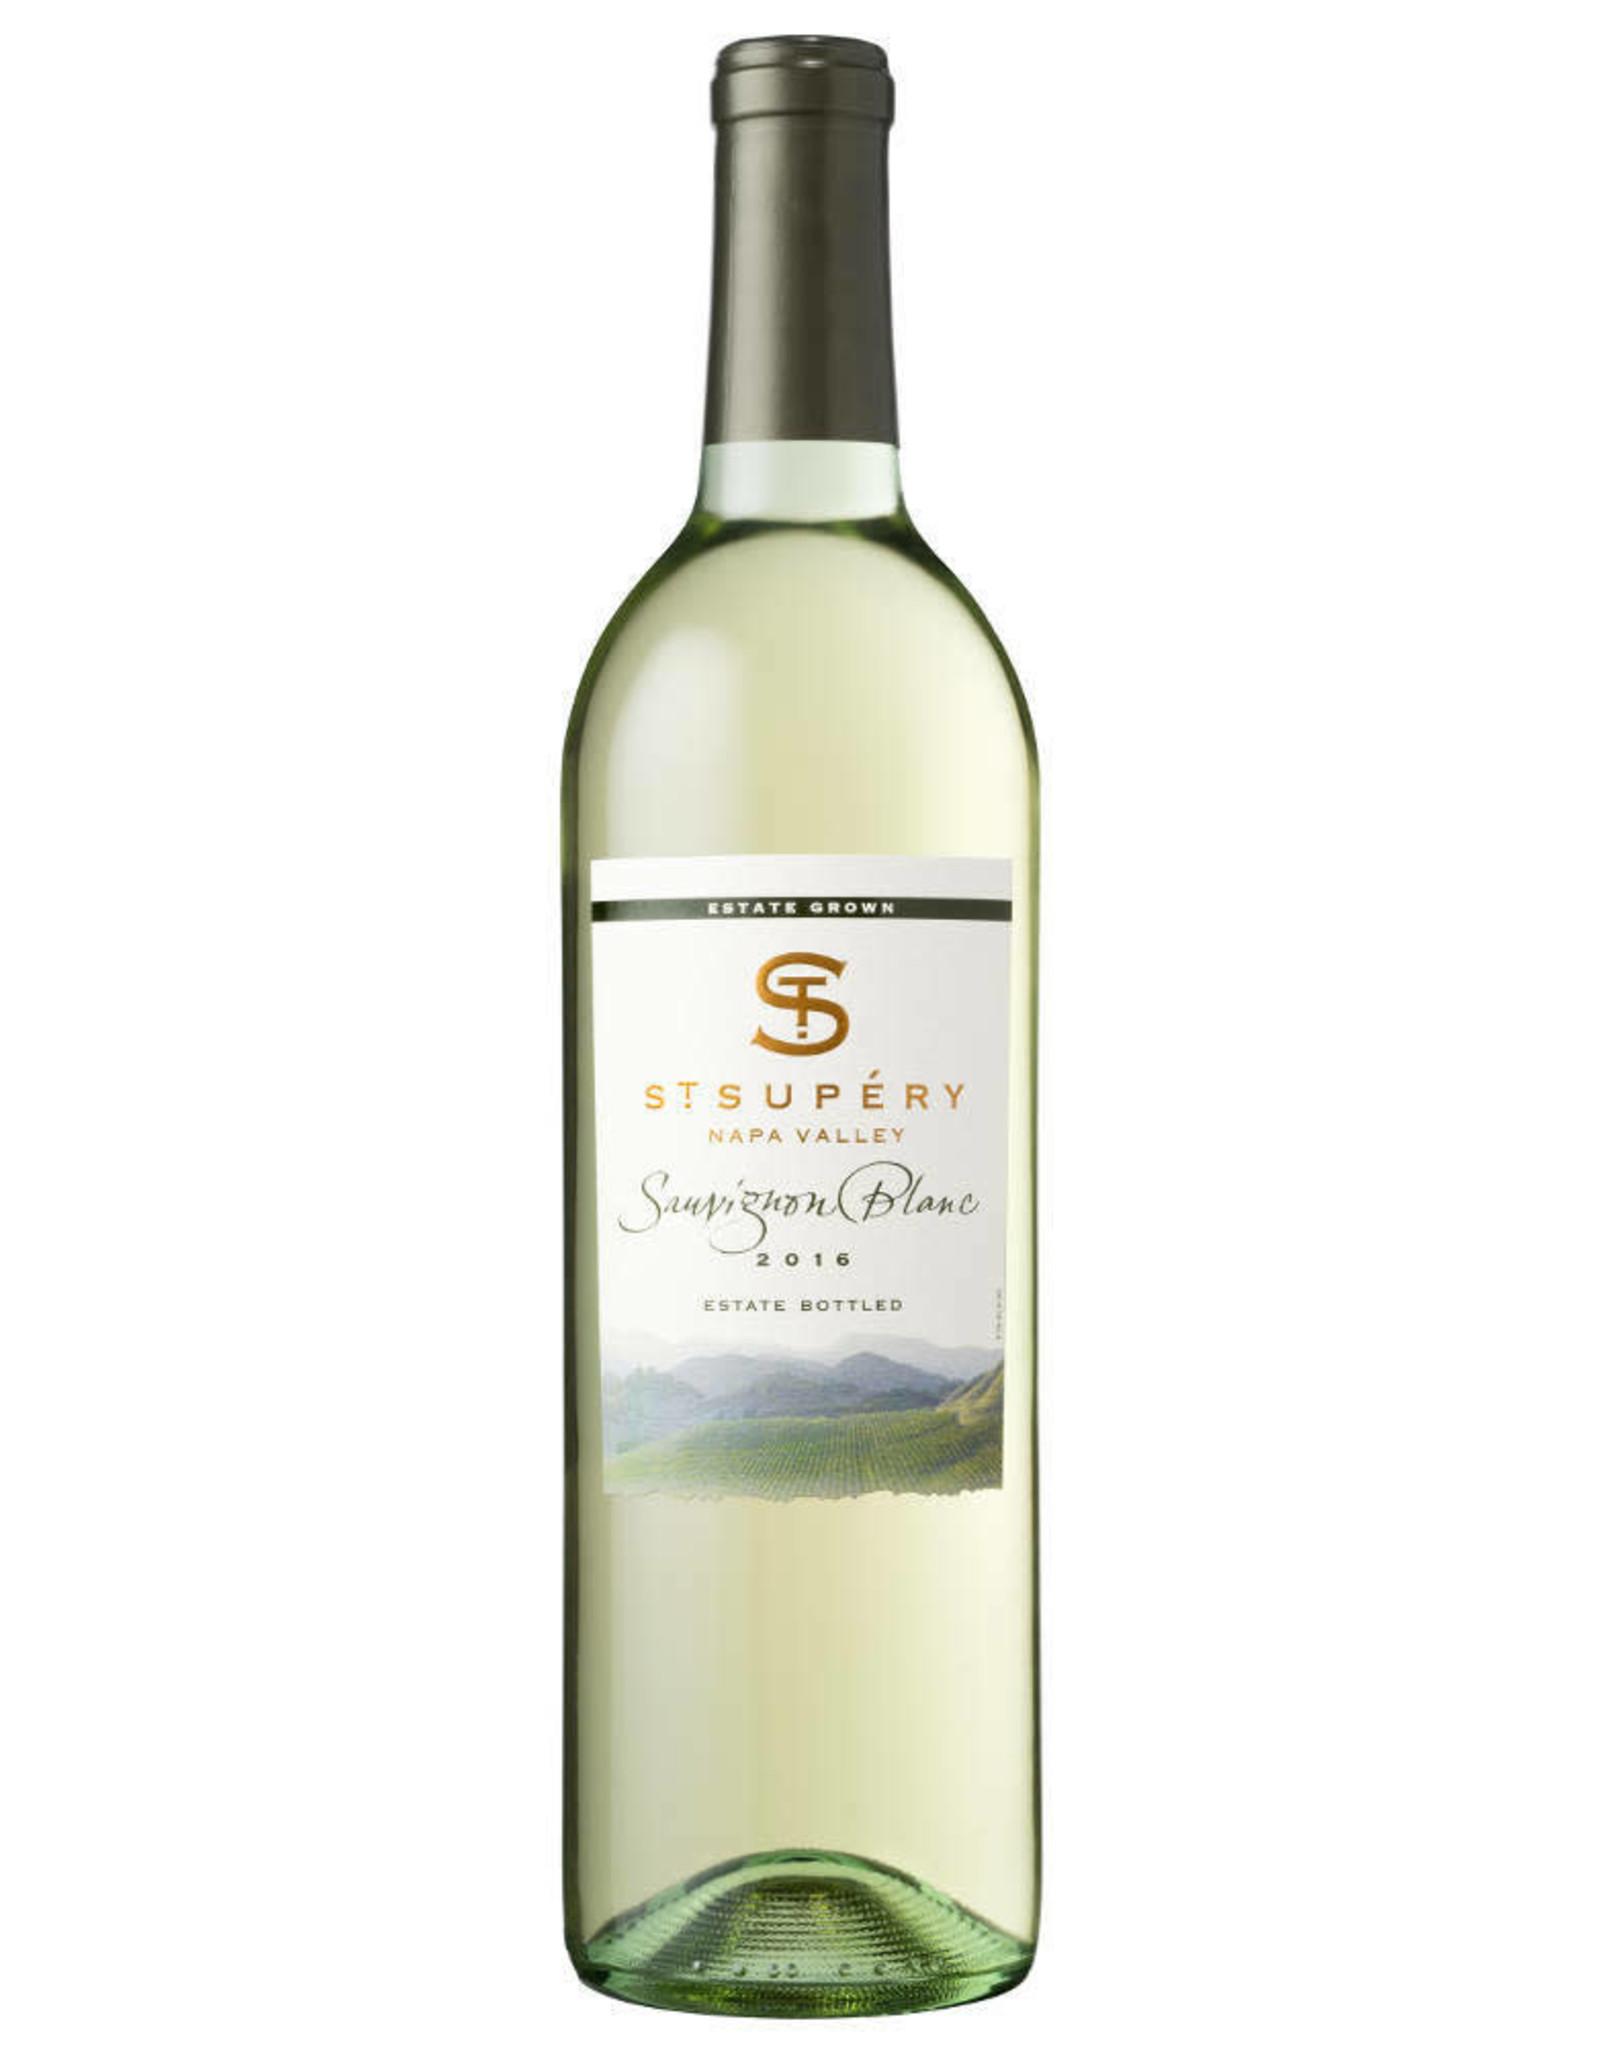 St Supery Sauvignon Blanc 2018